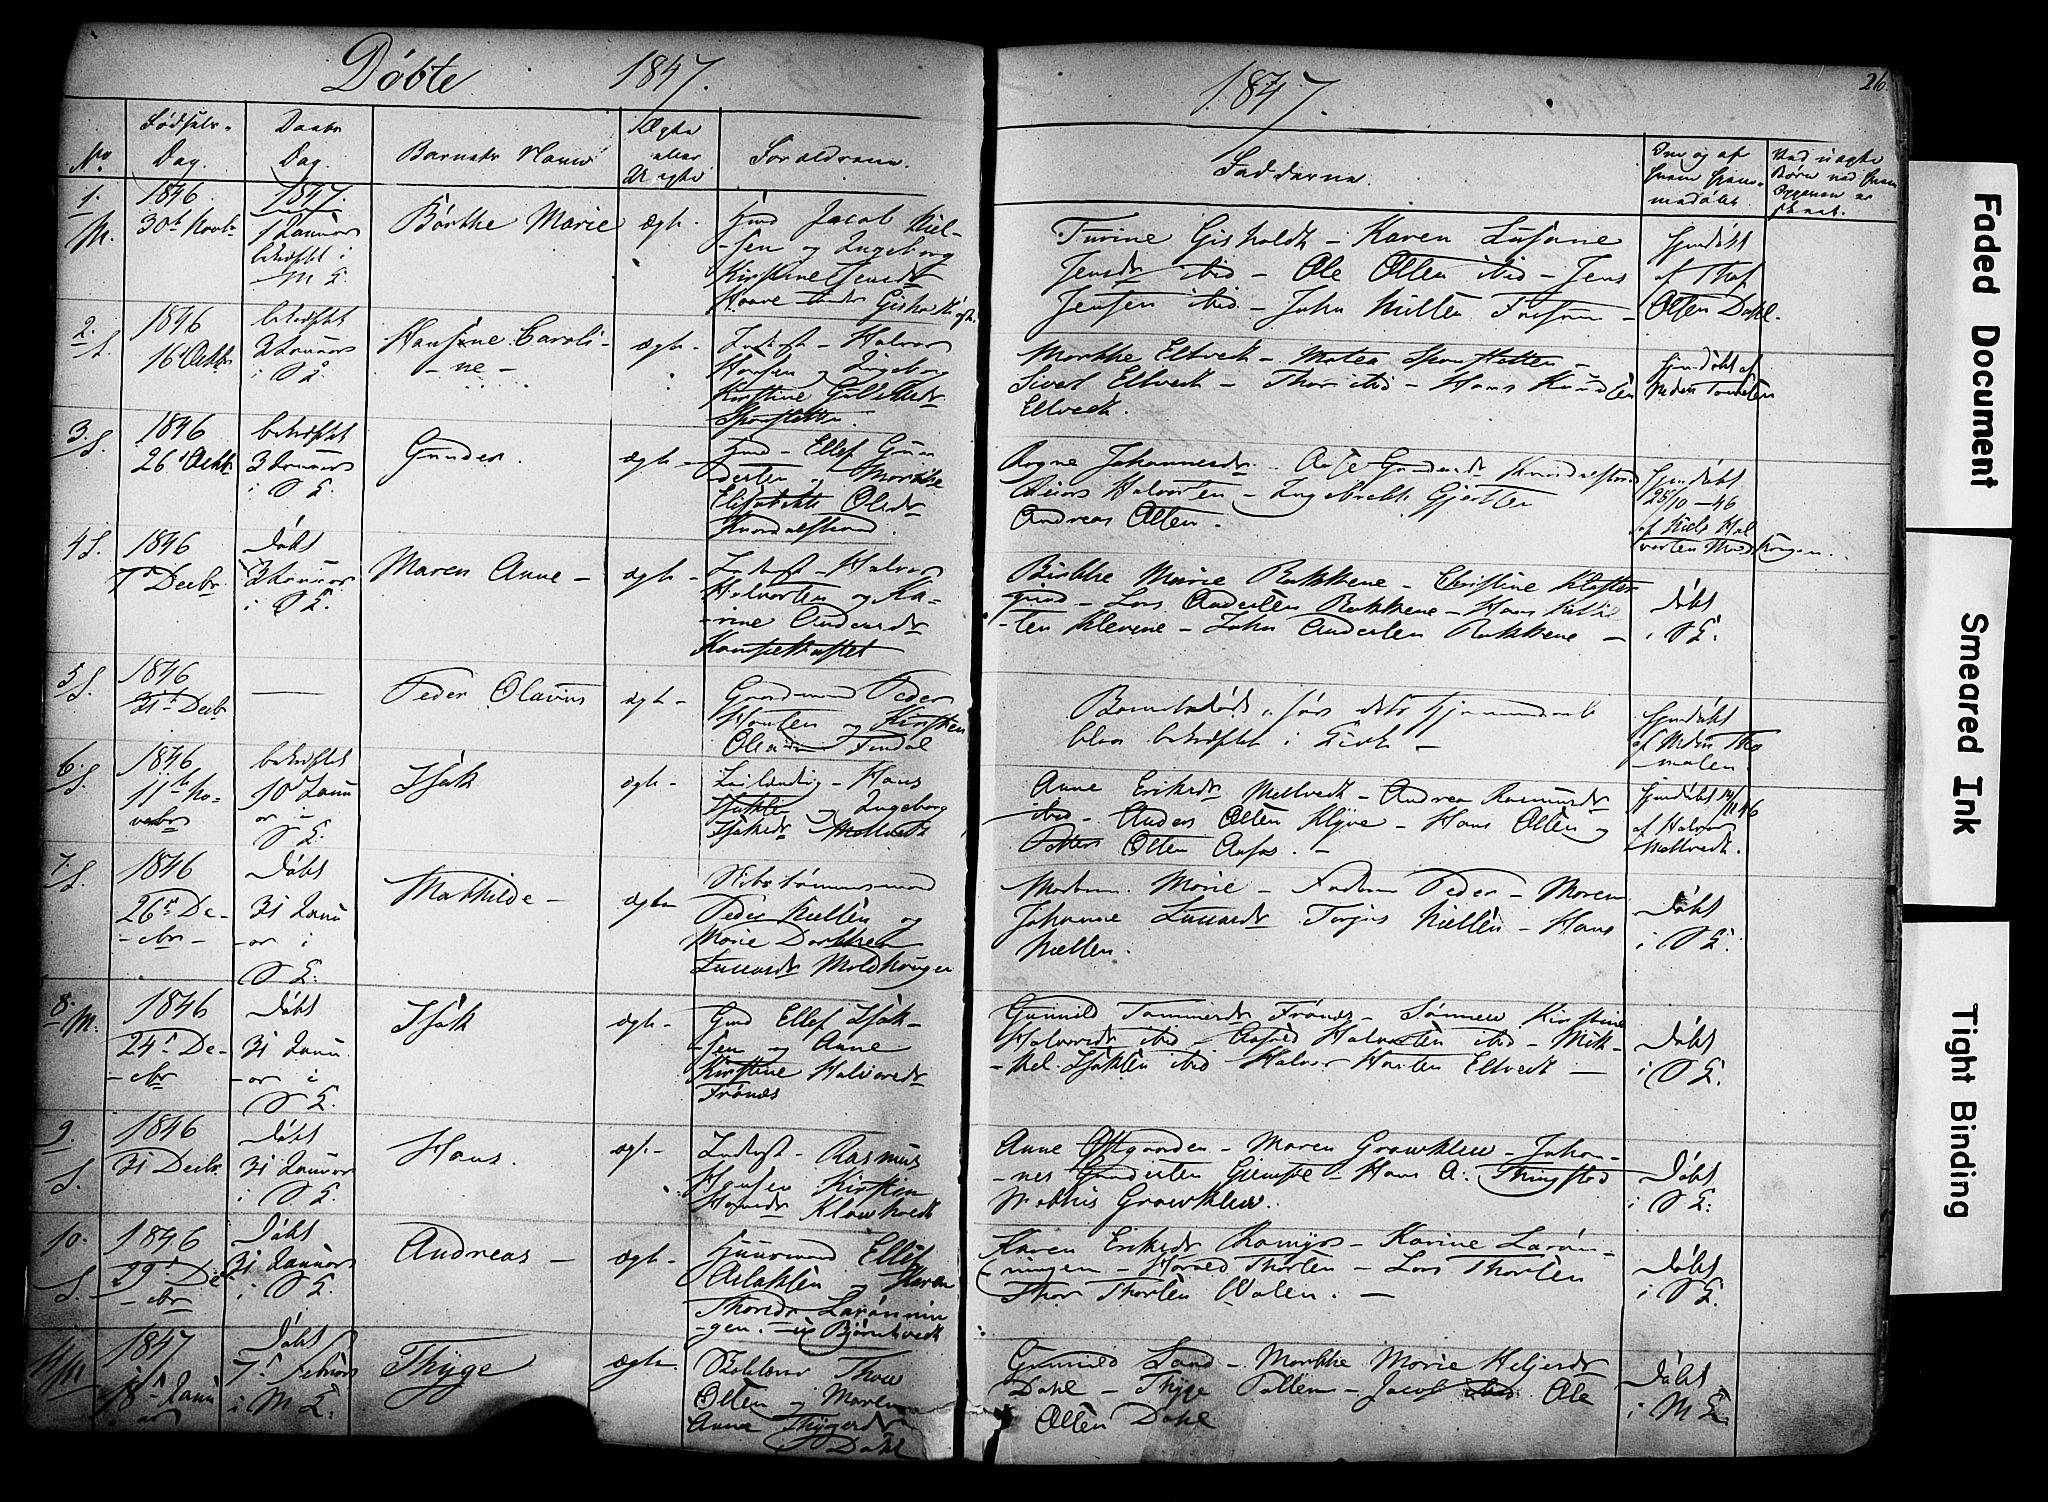 SAKO, Solum kirkebøker, F/Fa/L0006: Ministerialbok nr. I 6, 1844-1855, s. 26